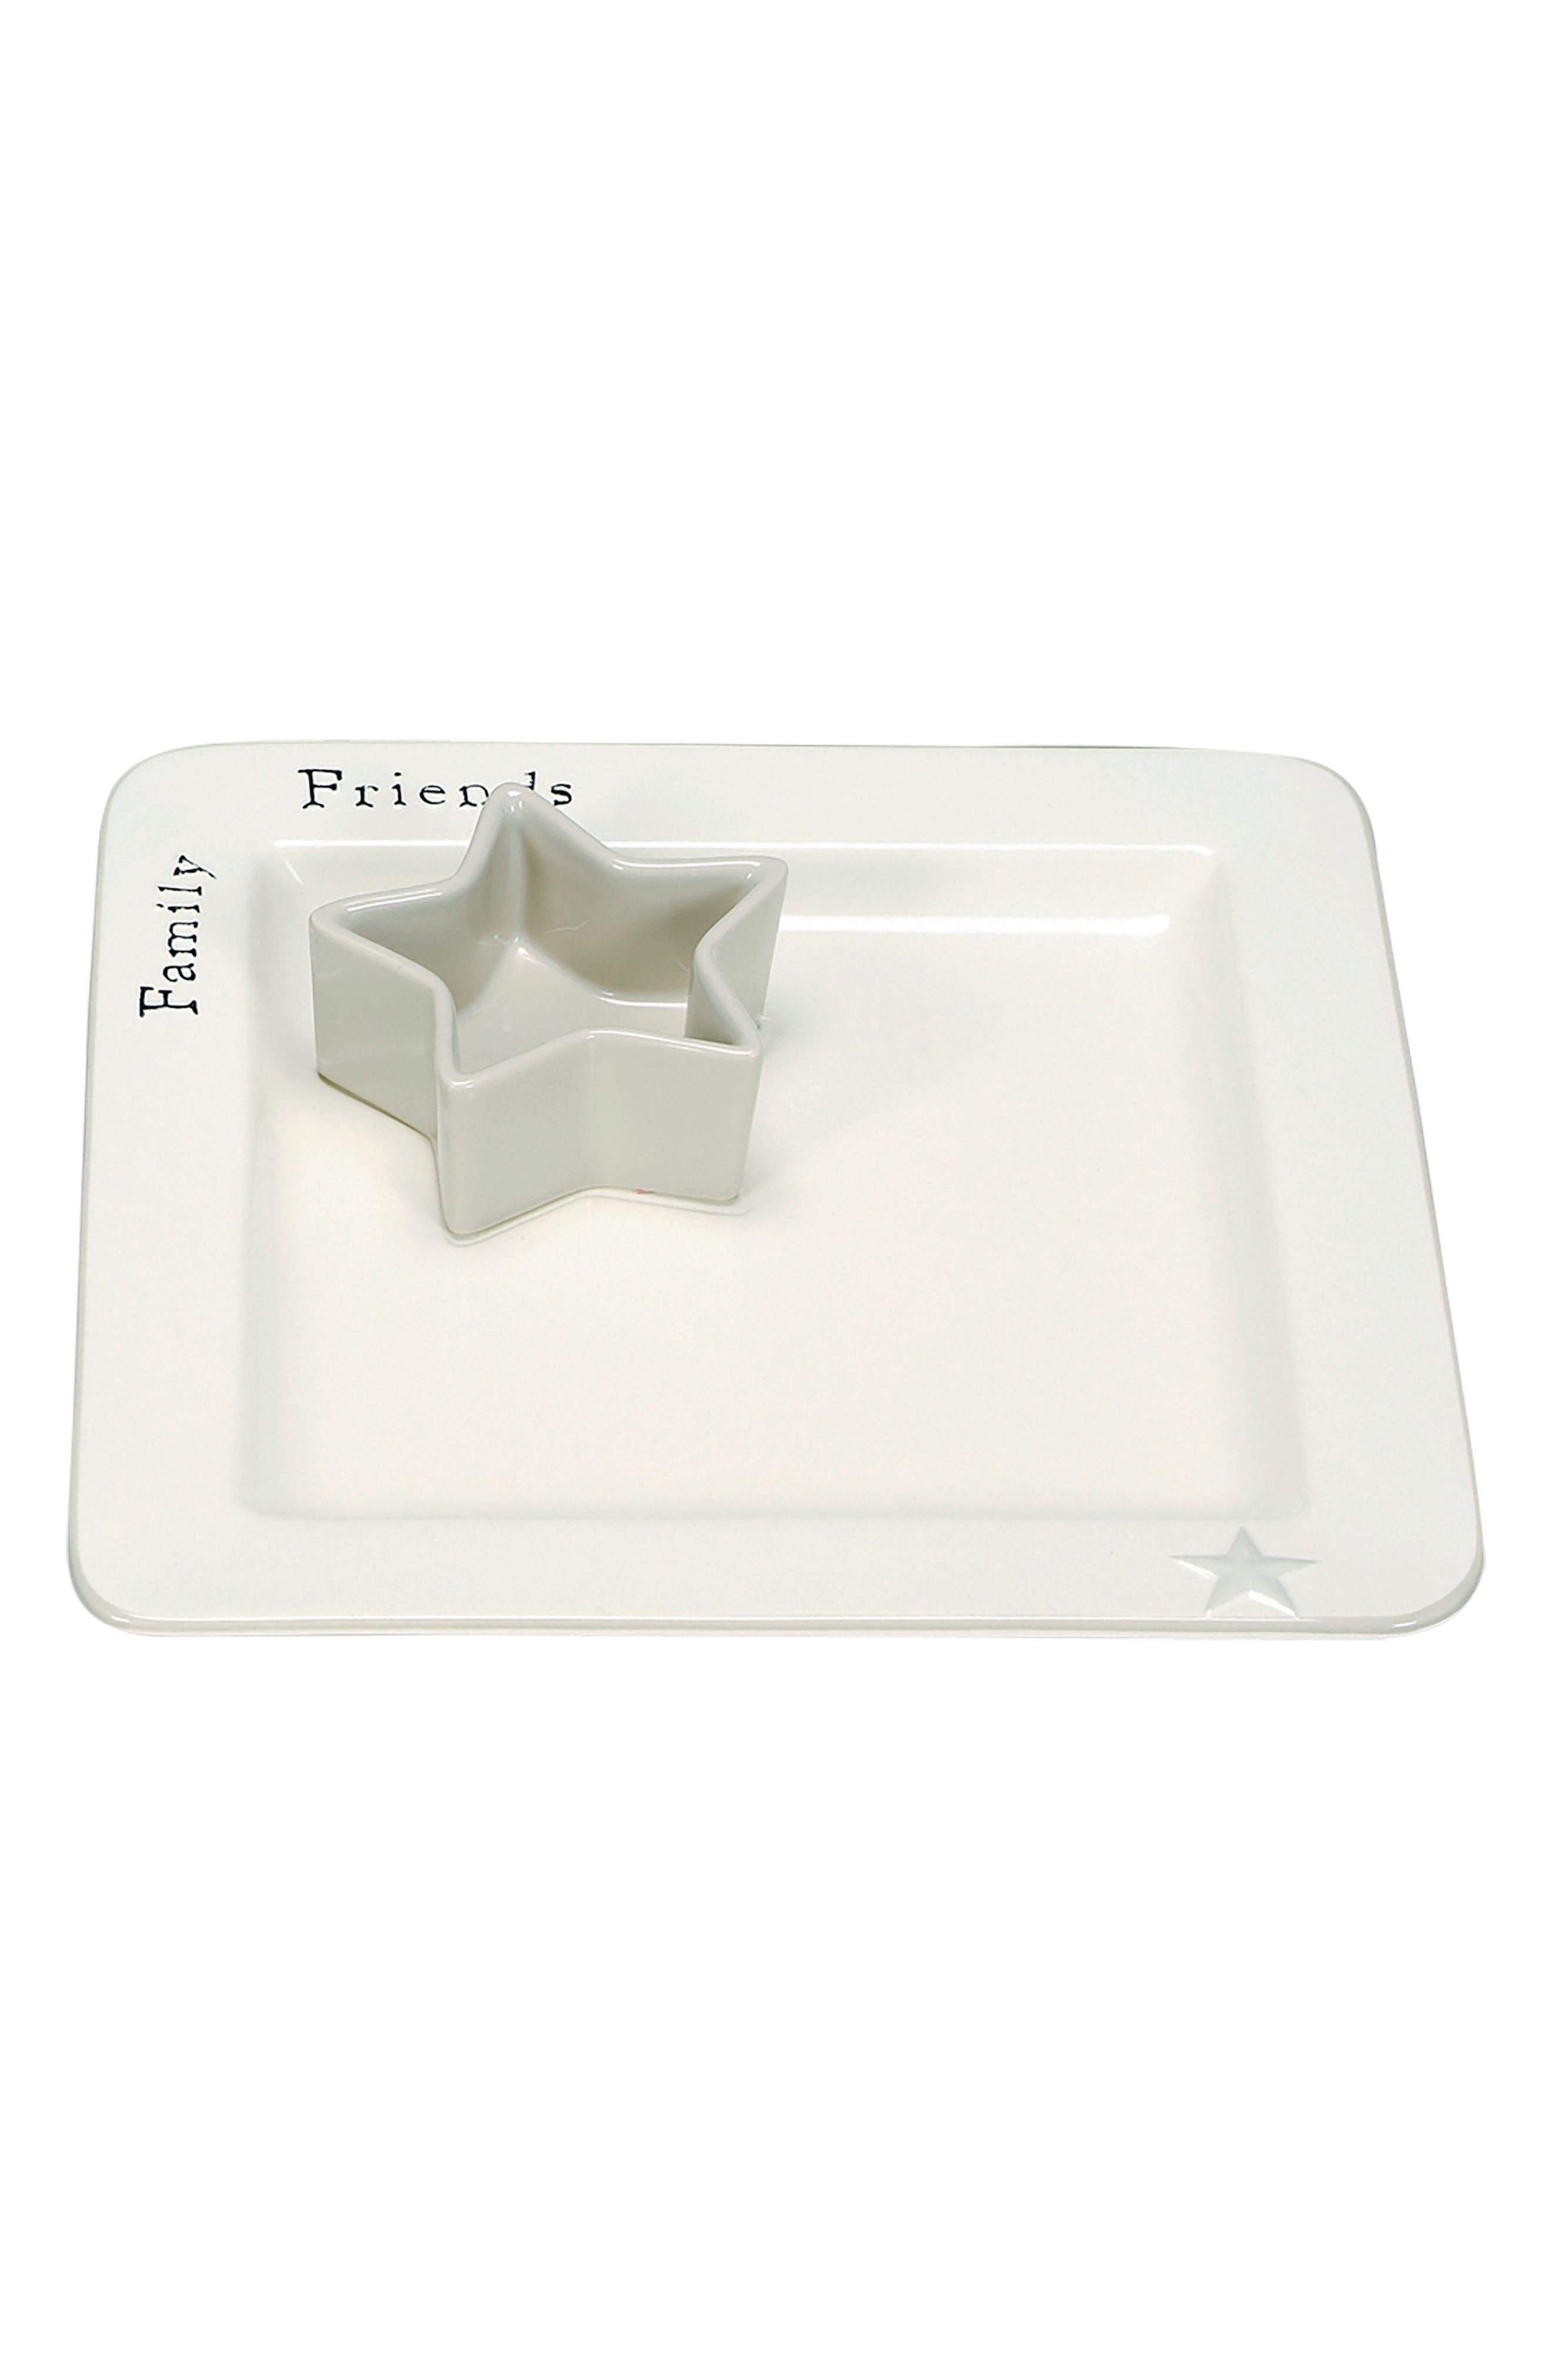 Word Expressions Serving Platter & Bowl Set,                         Main,                         color, 100